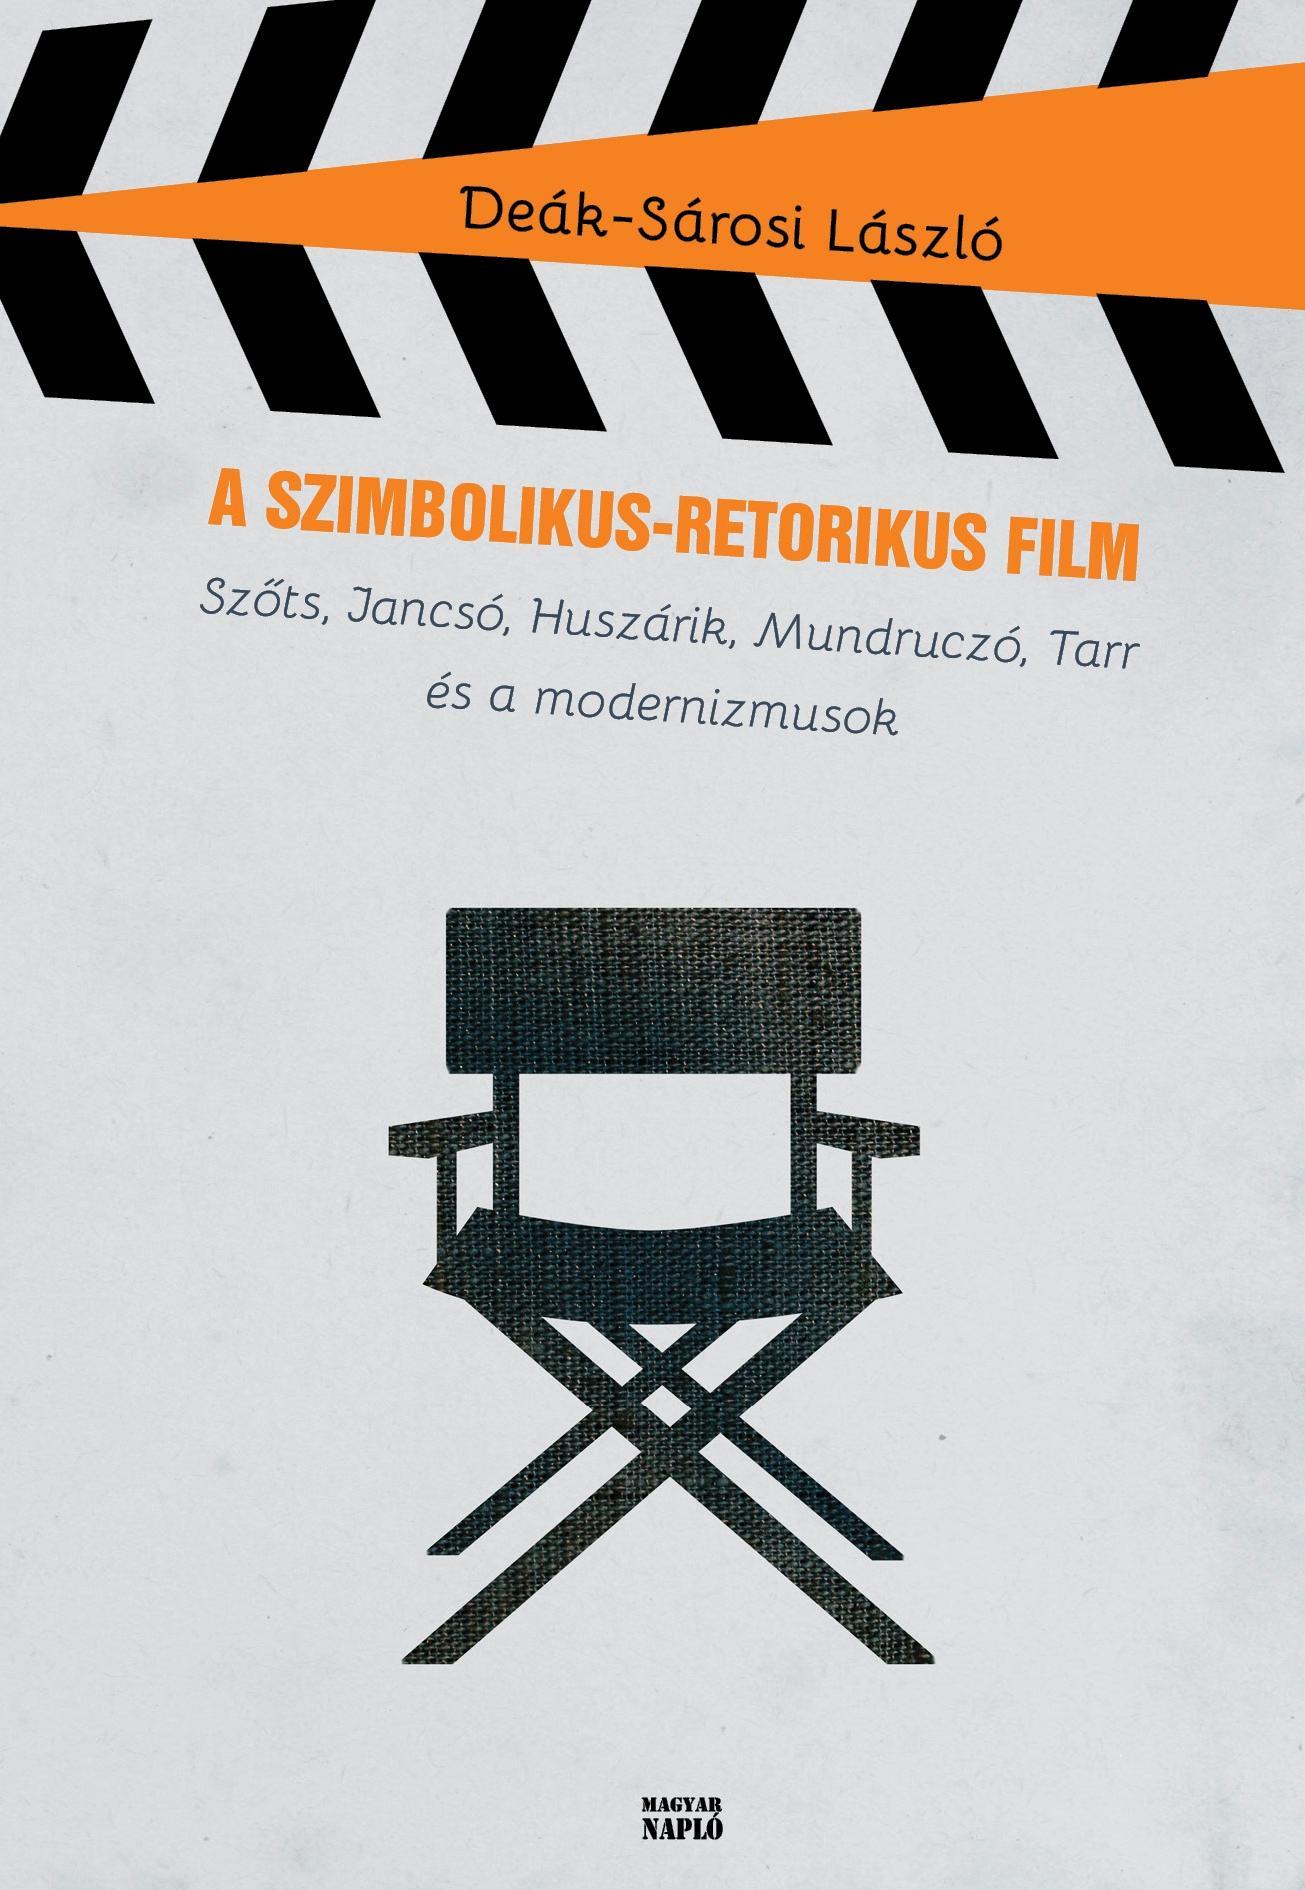 A SZIMBOLIKUS-RETORIKUS FILM